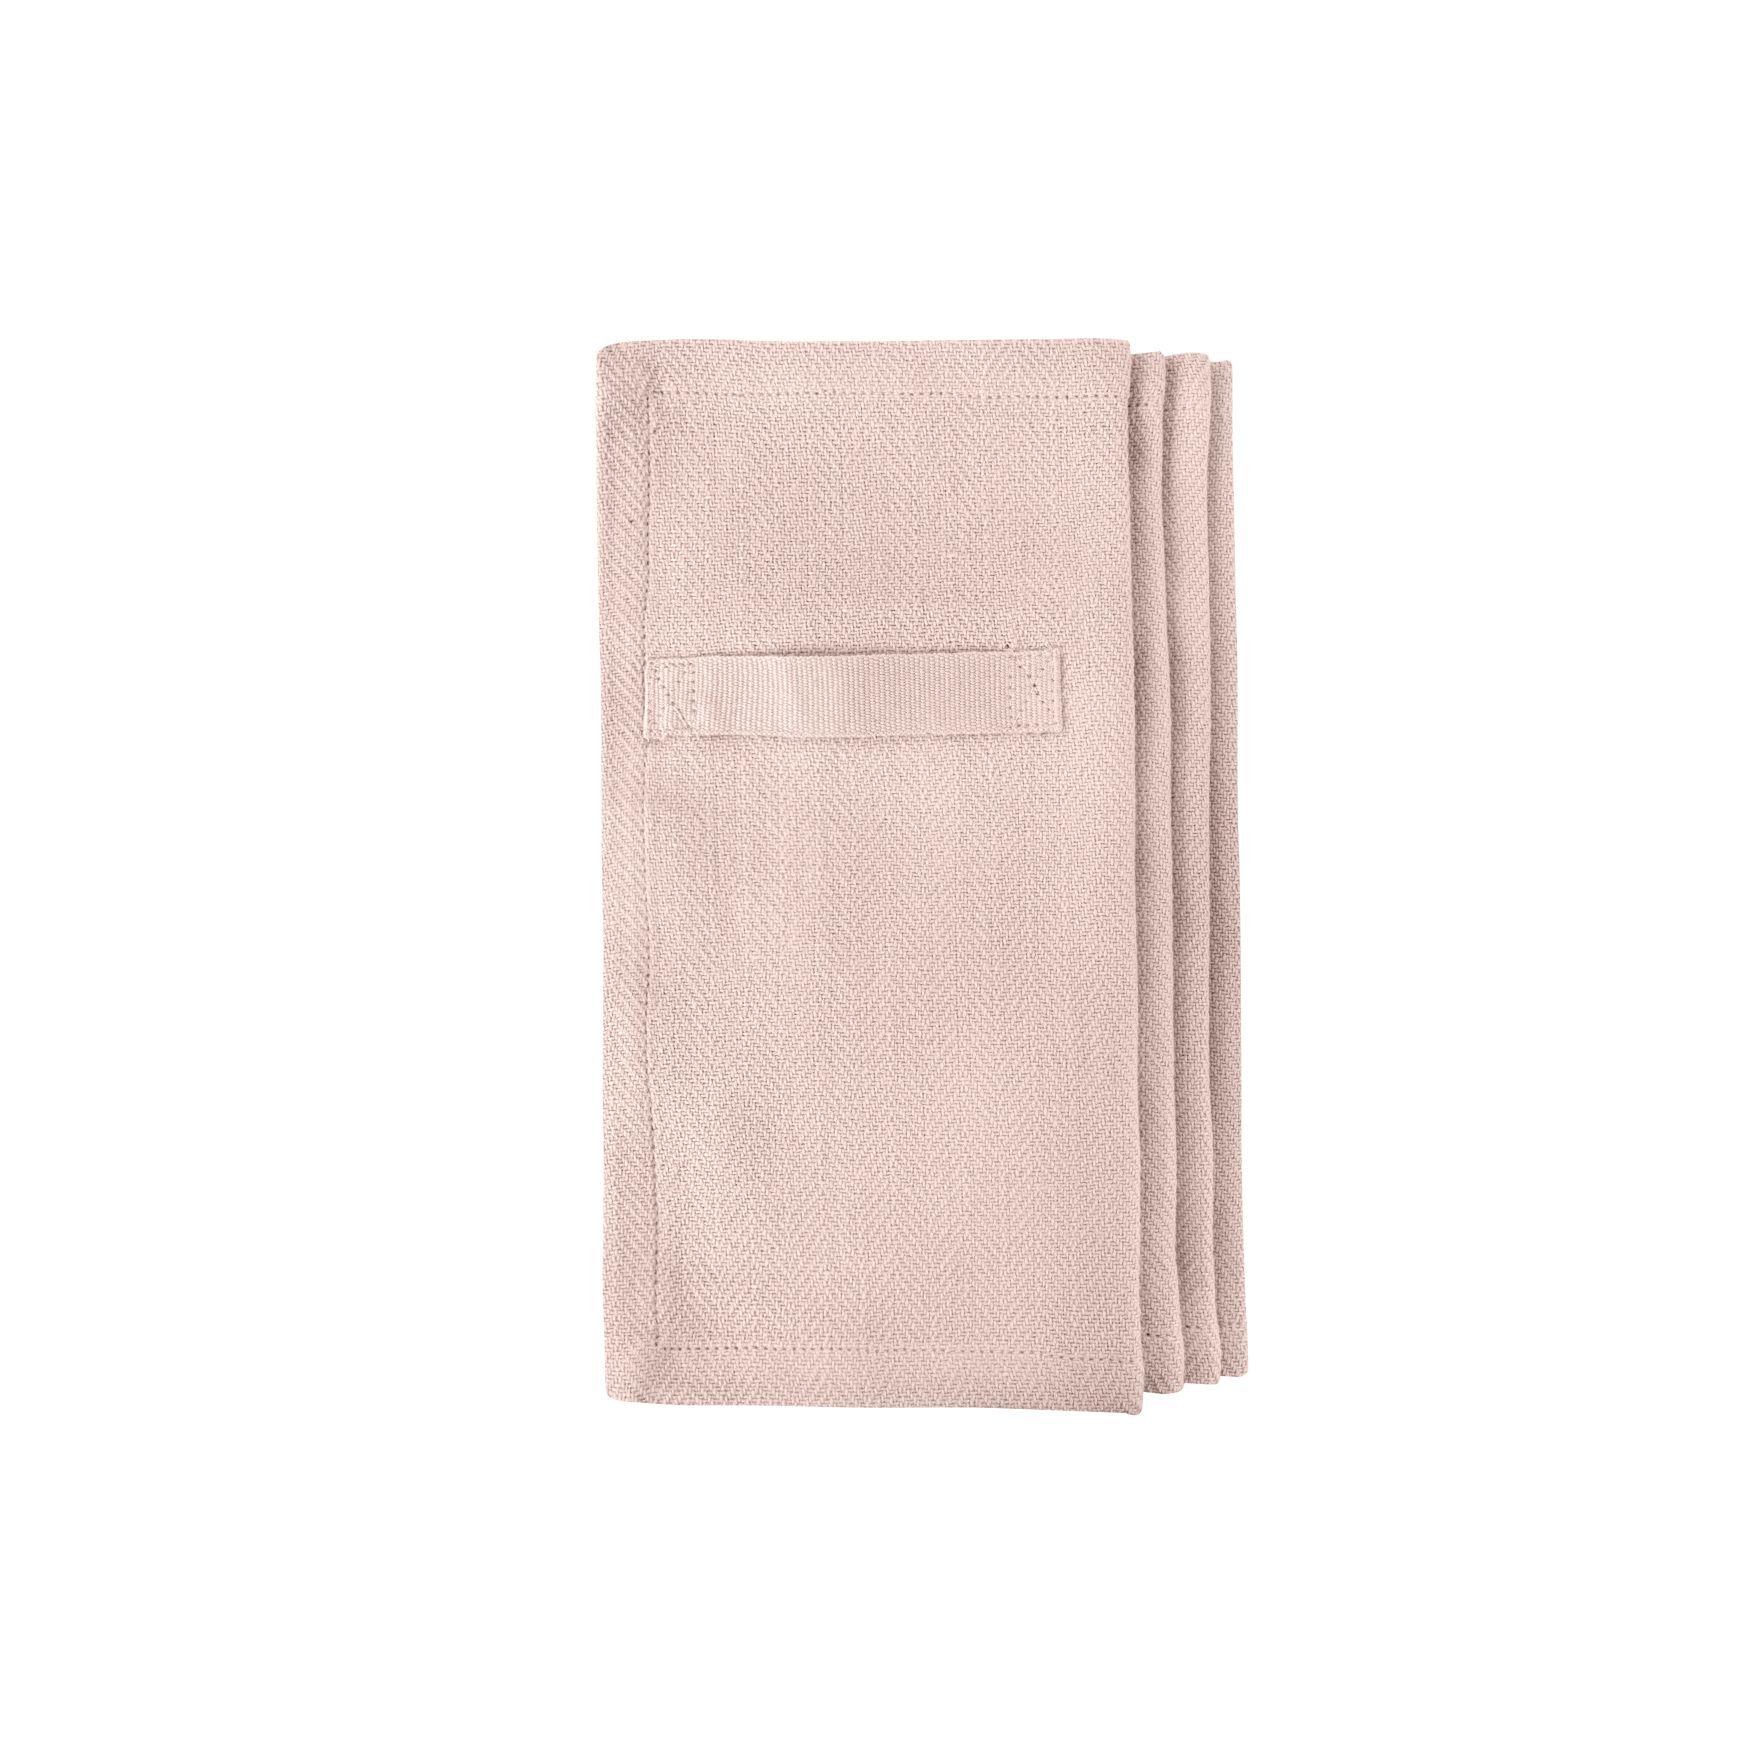 The Organic Company serviet, 20x20 cm, lys rosa, 4 stk